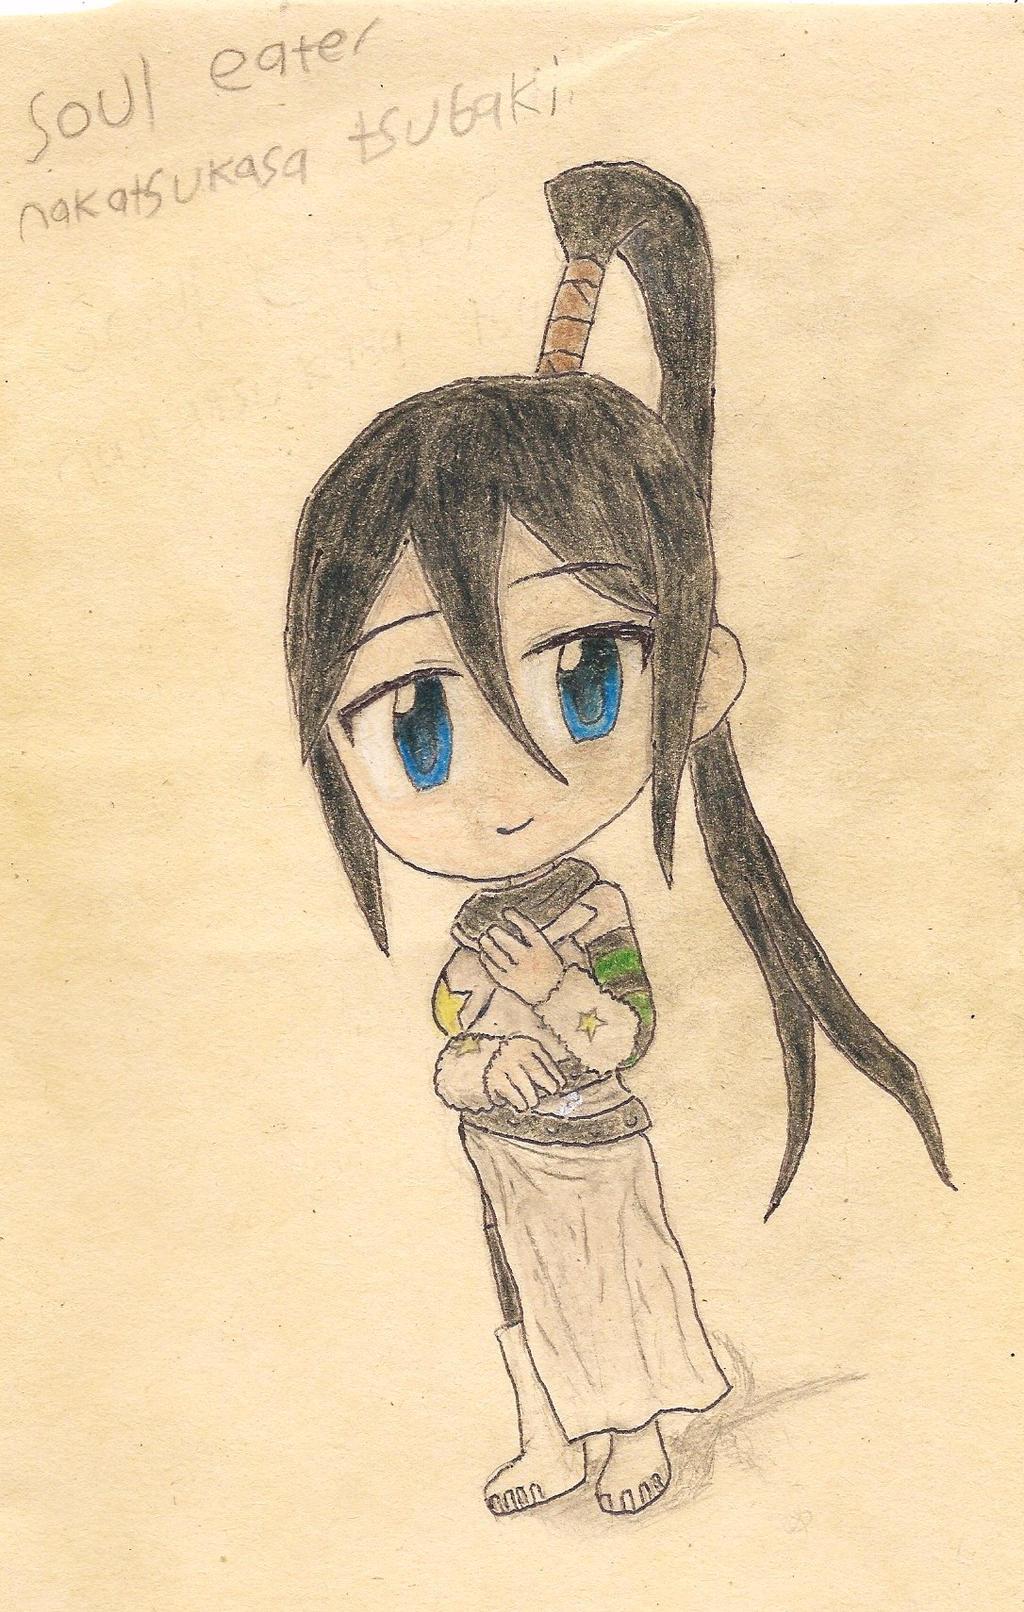 fan art: Nakatsukasa Tsubaki by JofDragon